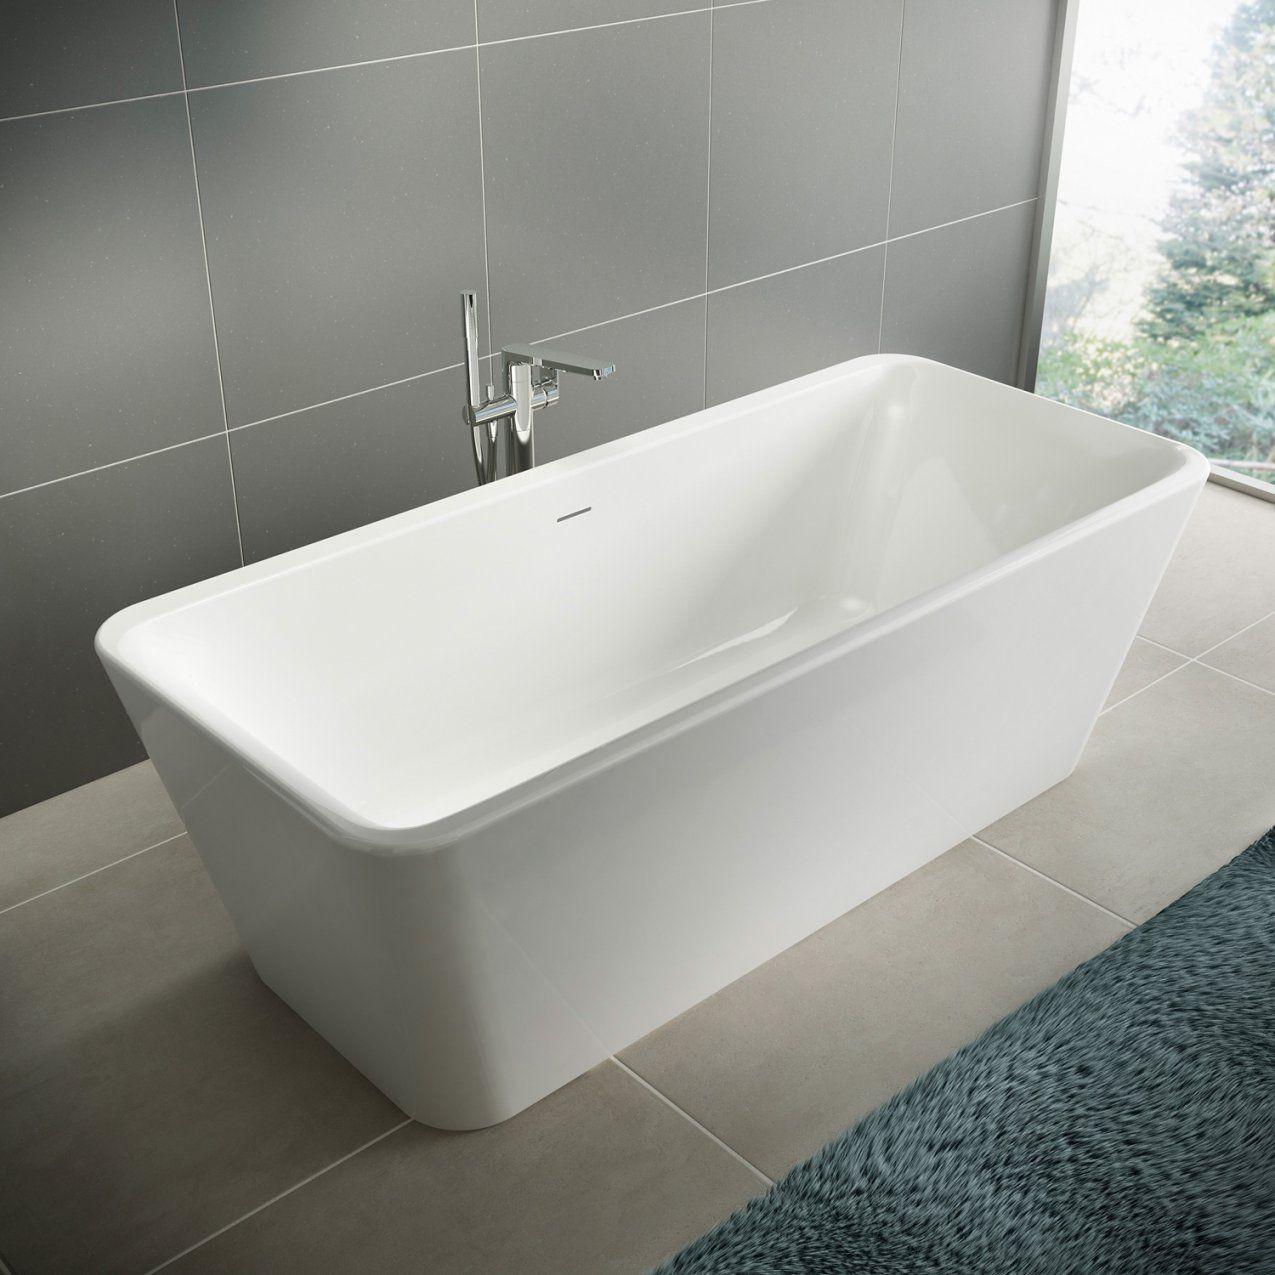 Ideal Standard Tonic Ii Badewanne Freistehend Badshop von Ideal Standard Freistehende Badewanne Photo